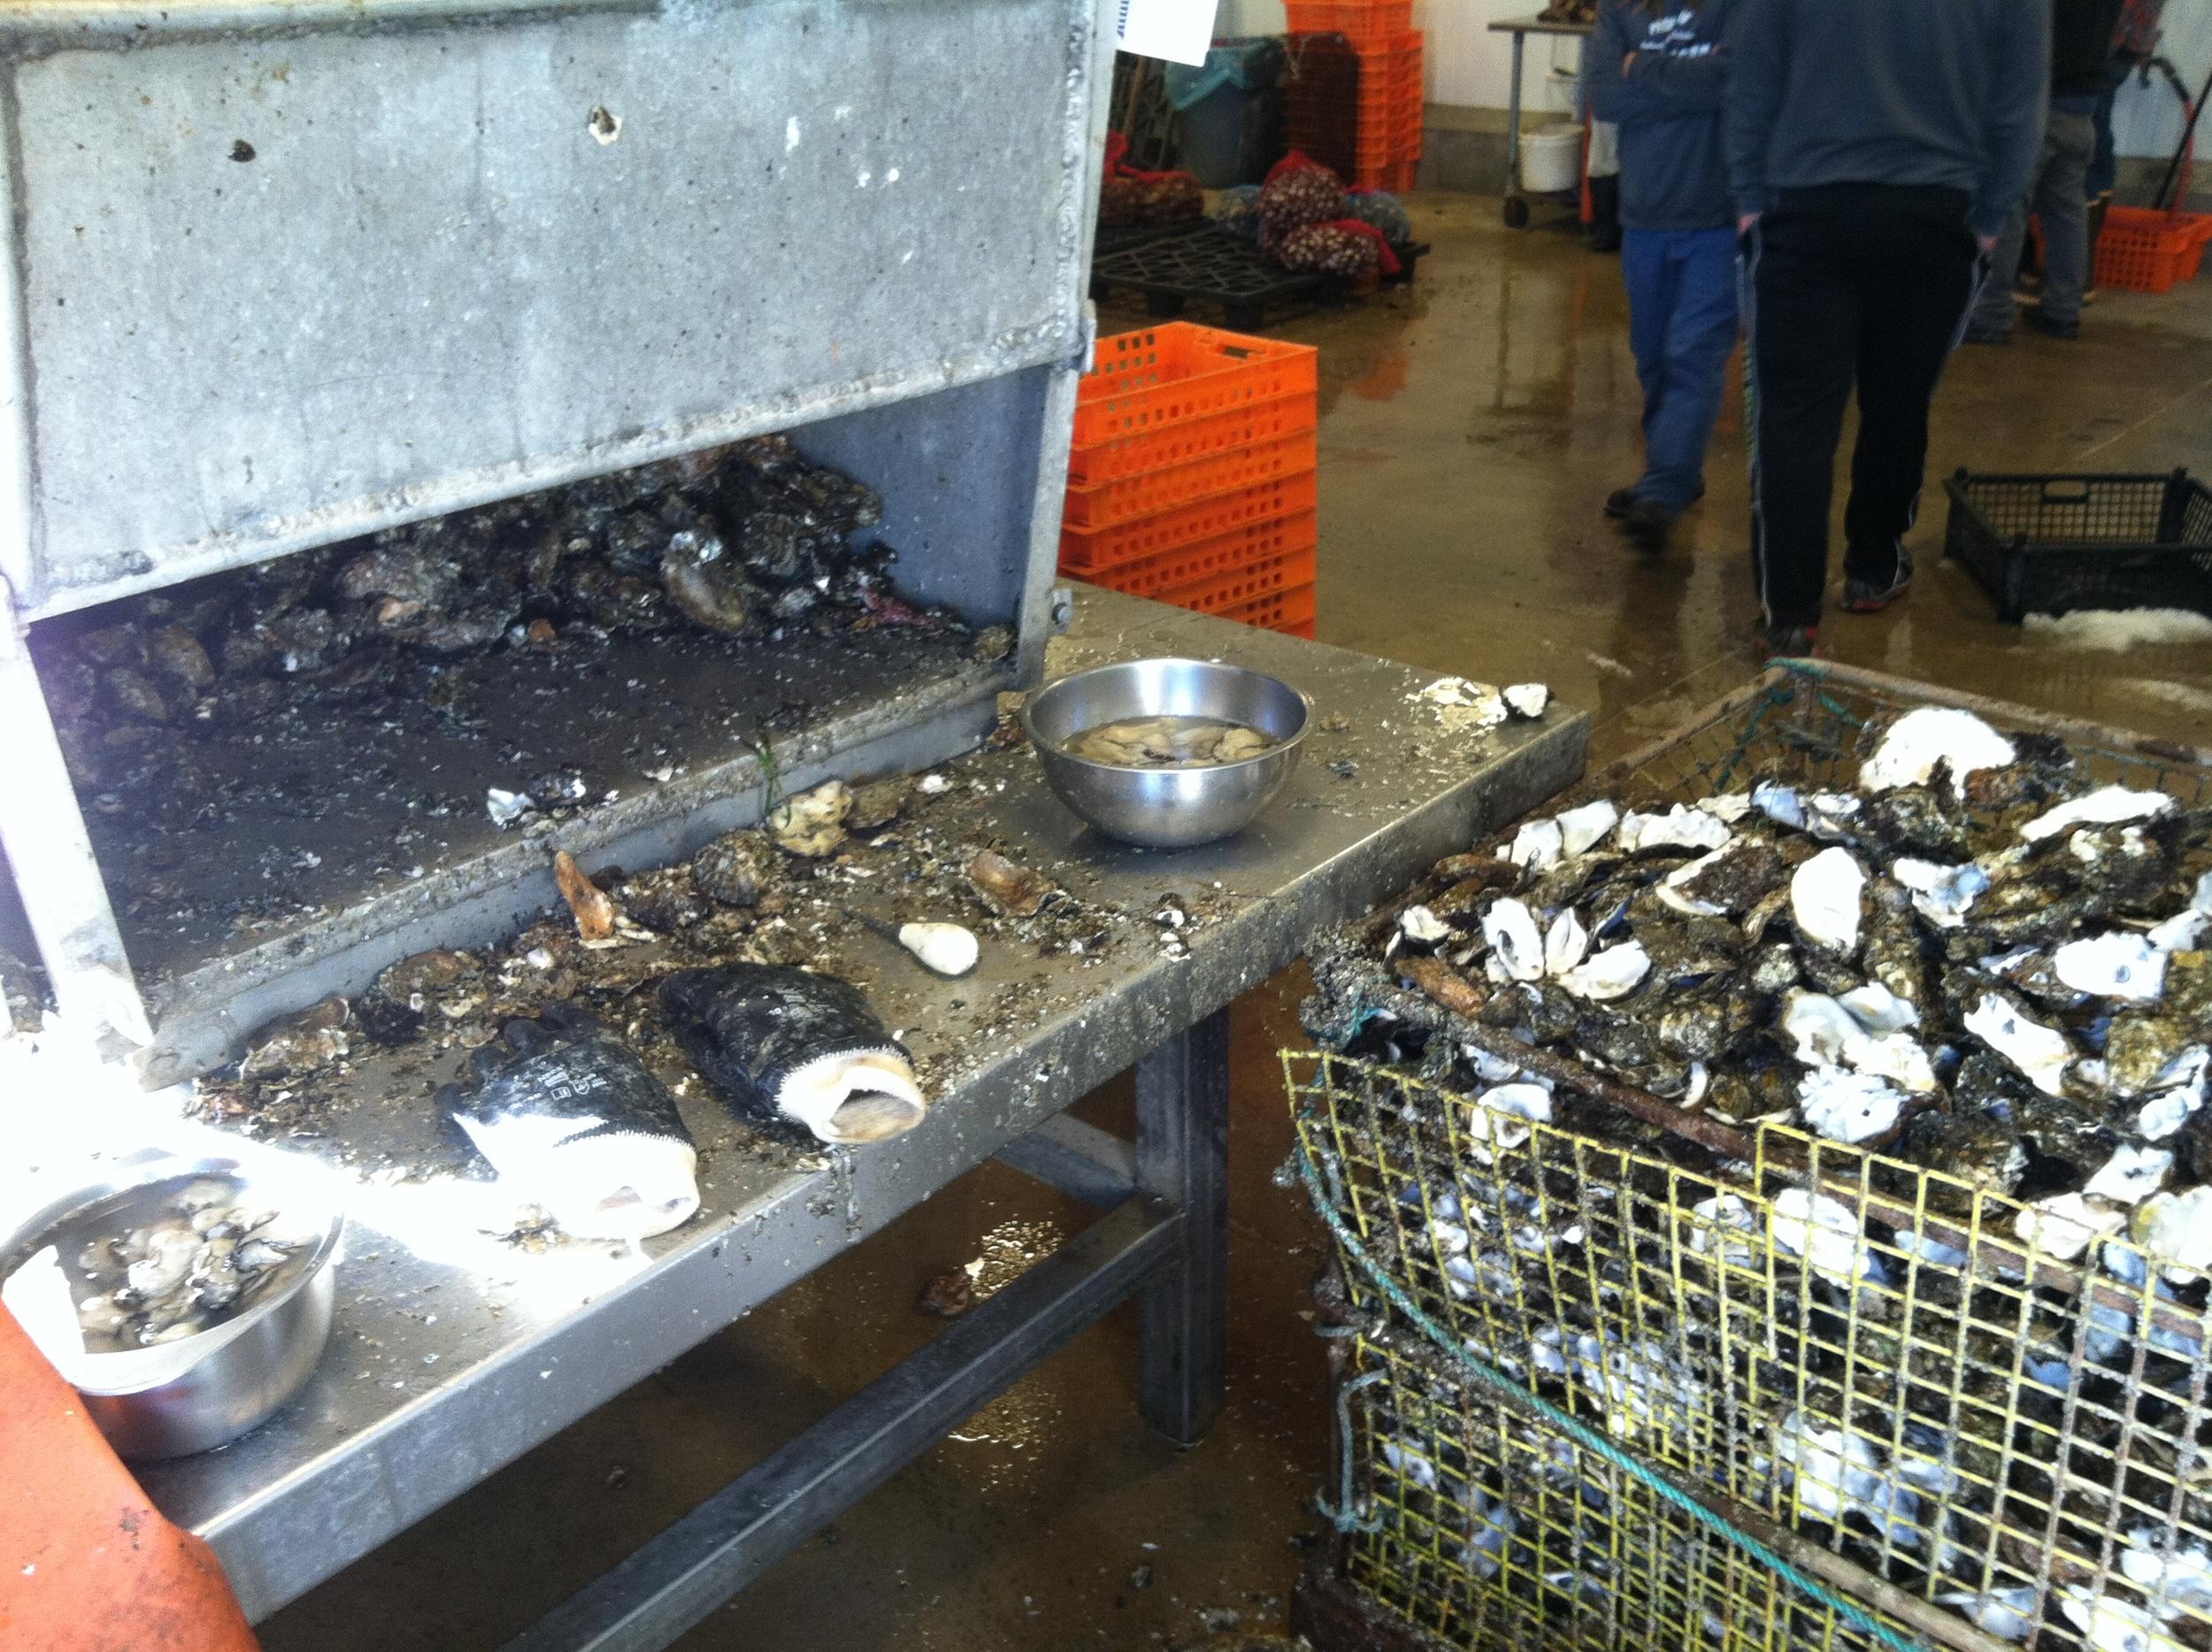 The shucking station at Hama Hama Oyster Company in Lilliwaup, WA.